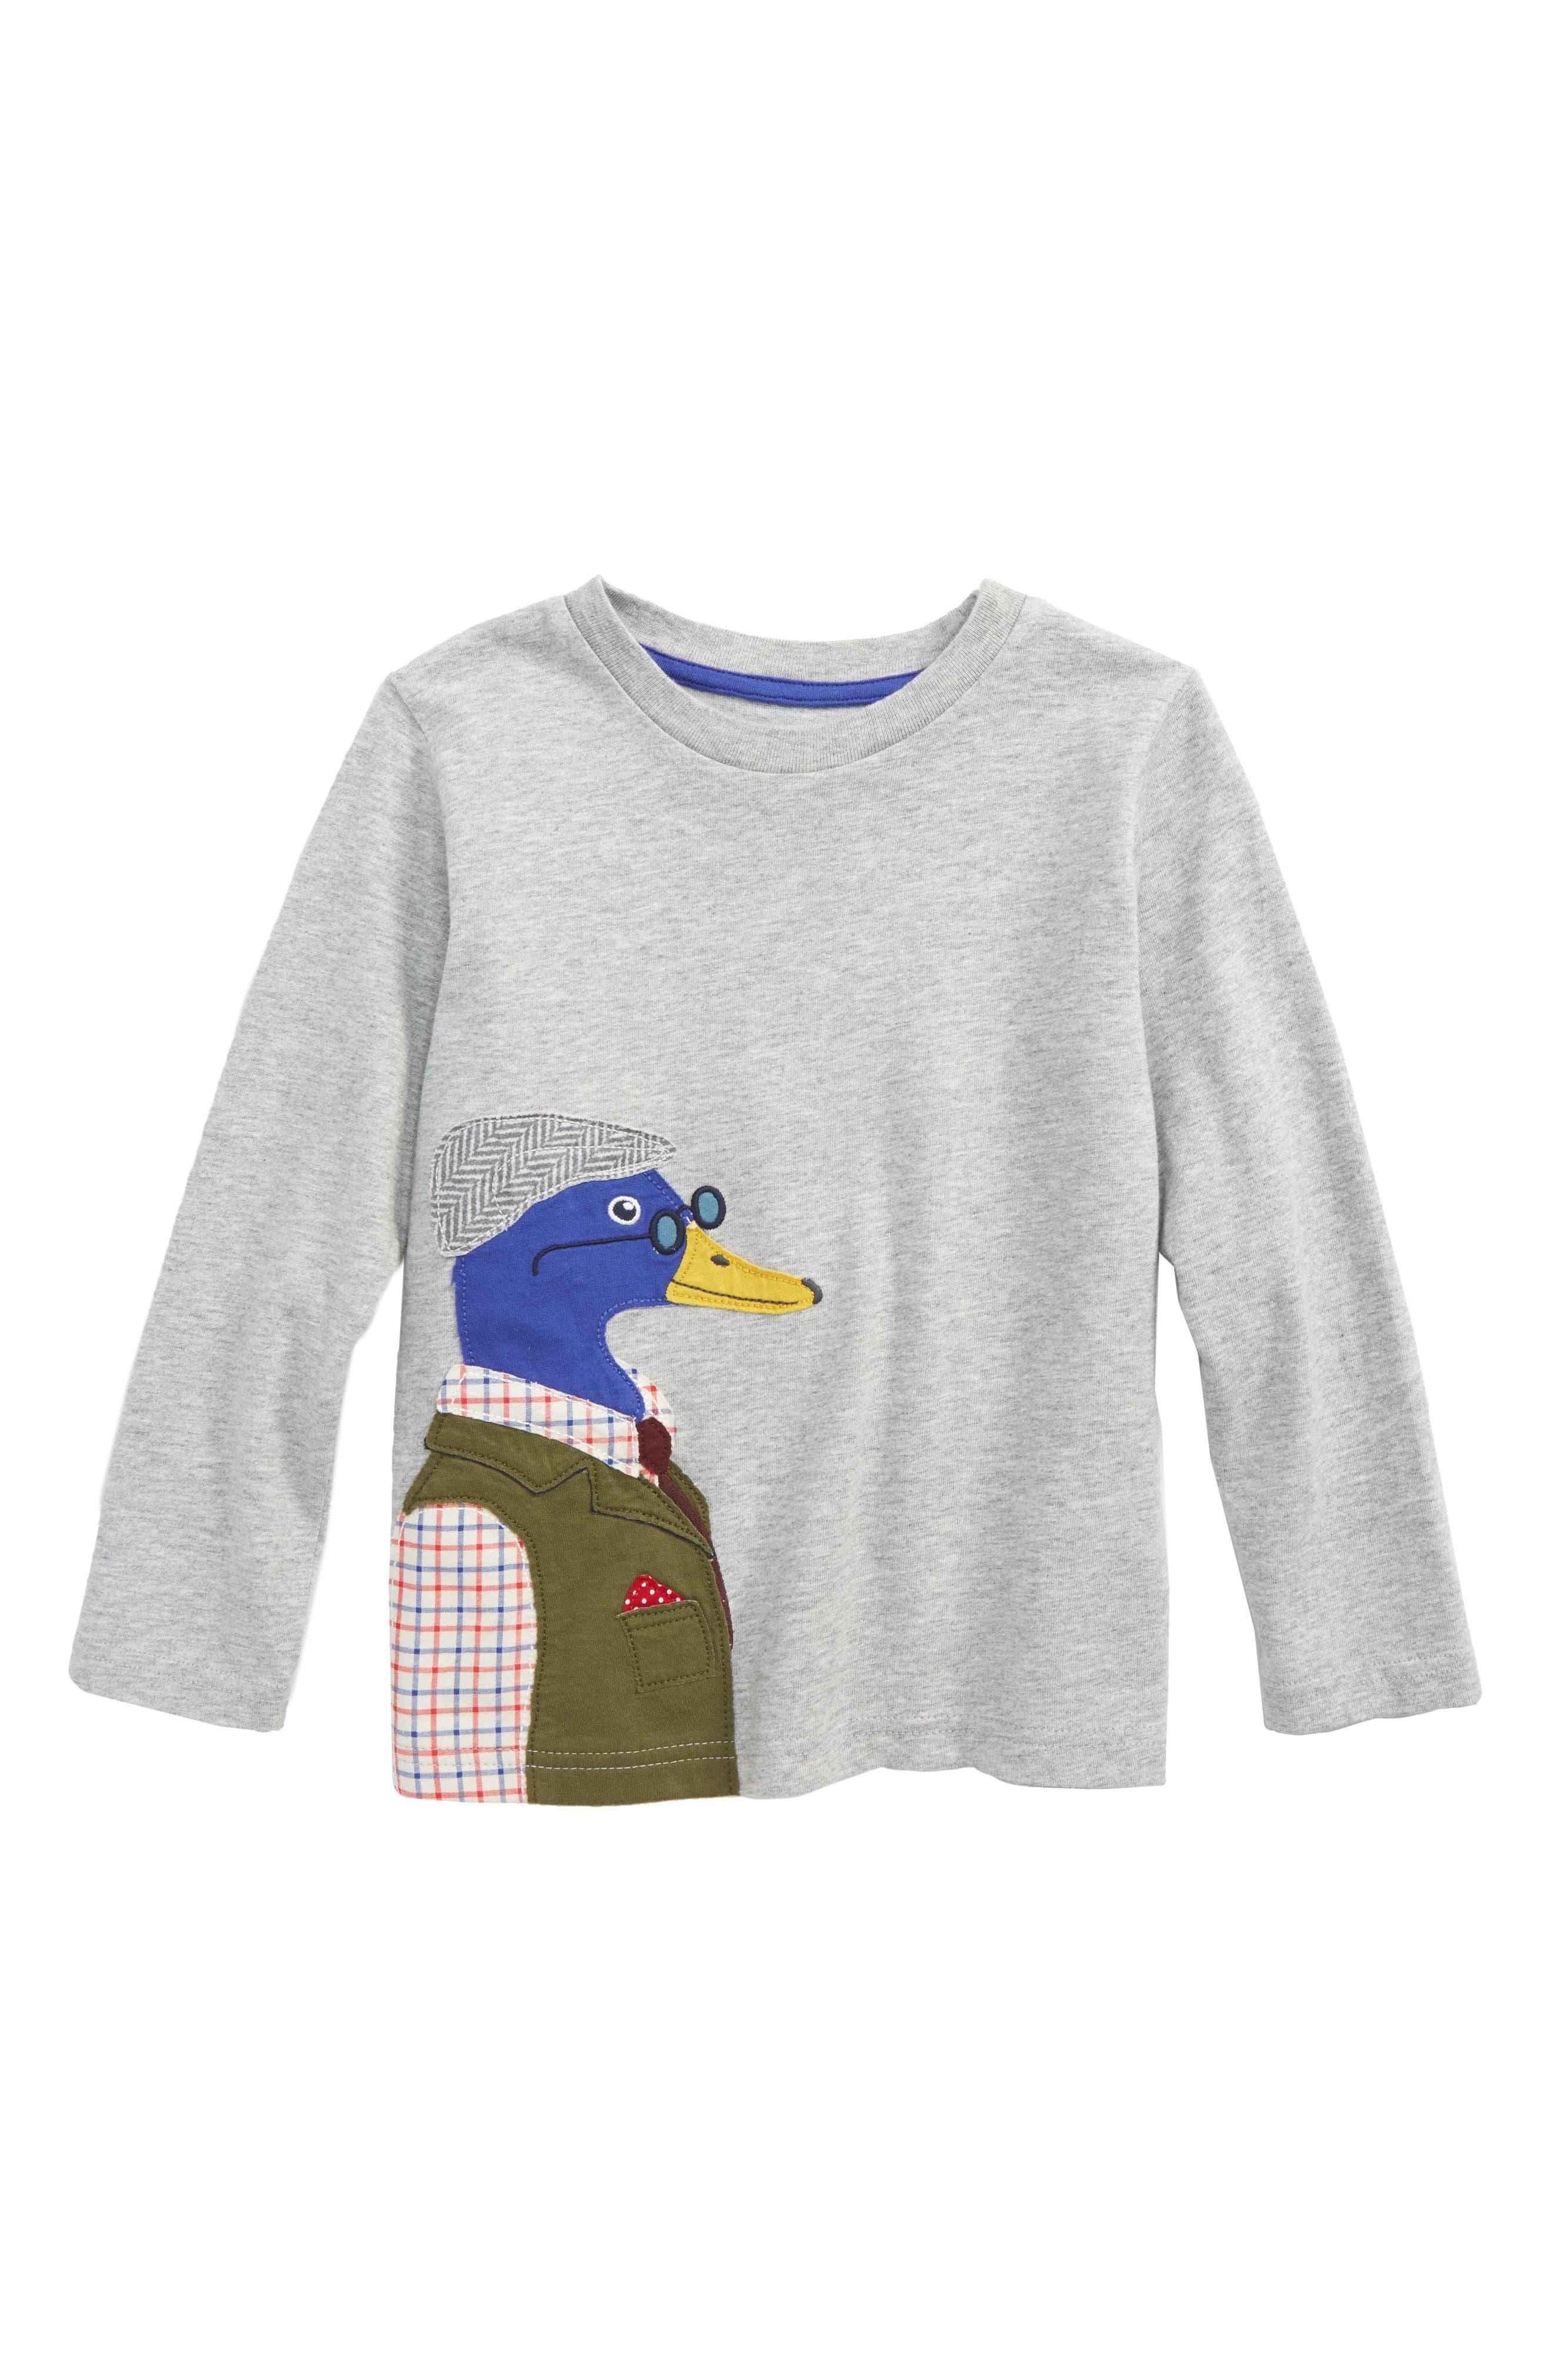 Mini Boden Splendid Animal Appliqué T-Shirt (Toddler Boys, Little Boys & Big Boys)